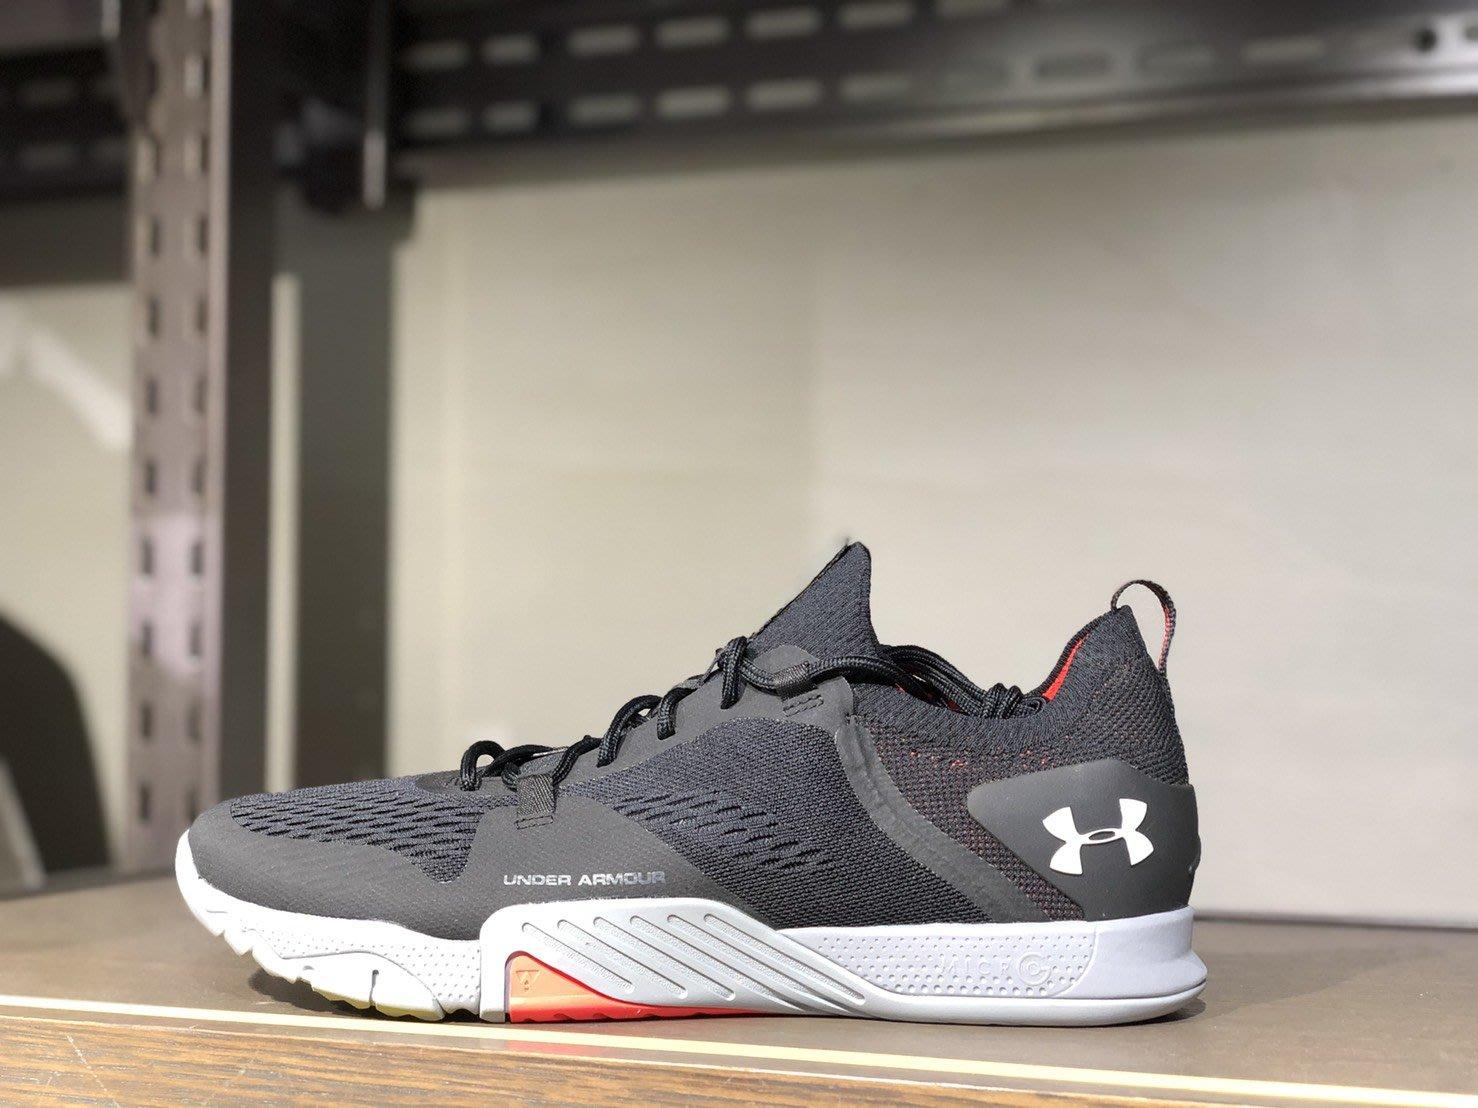 【G CORNER】Under Armour UA 訓練鞋 健身 重訓 訓練 多色 男鞋 3022613-002